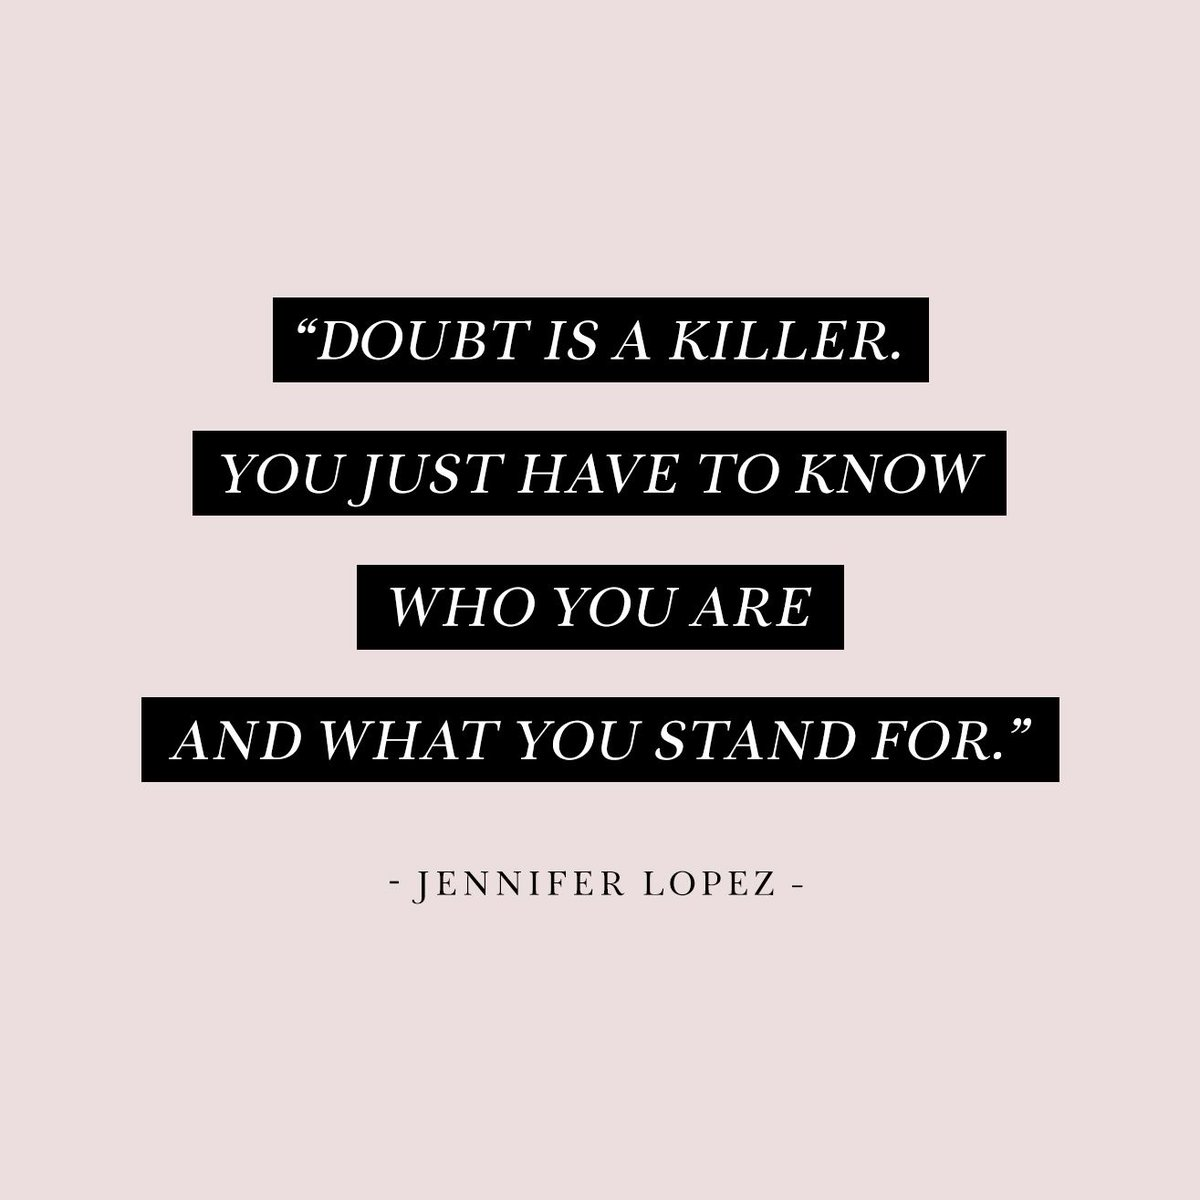 Don't doubt. Believe.    #empoweringwomen #femaleempowerment #empoweringquotes #motivationalquote #womeninbusiness #mindsetiseverything   #doubtisout #doubtisthekillerofdreams #jloquotes #jenniferlopez #jlo #JLoJenniferLopez #jlosuperbowl #inauguration